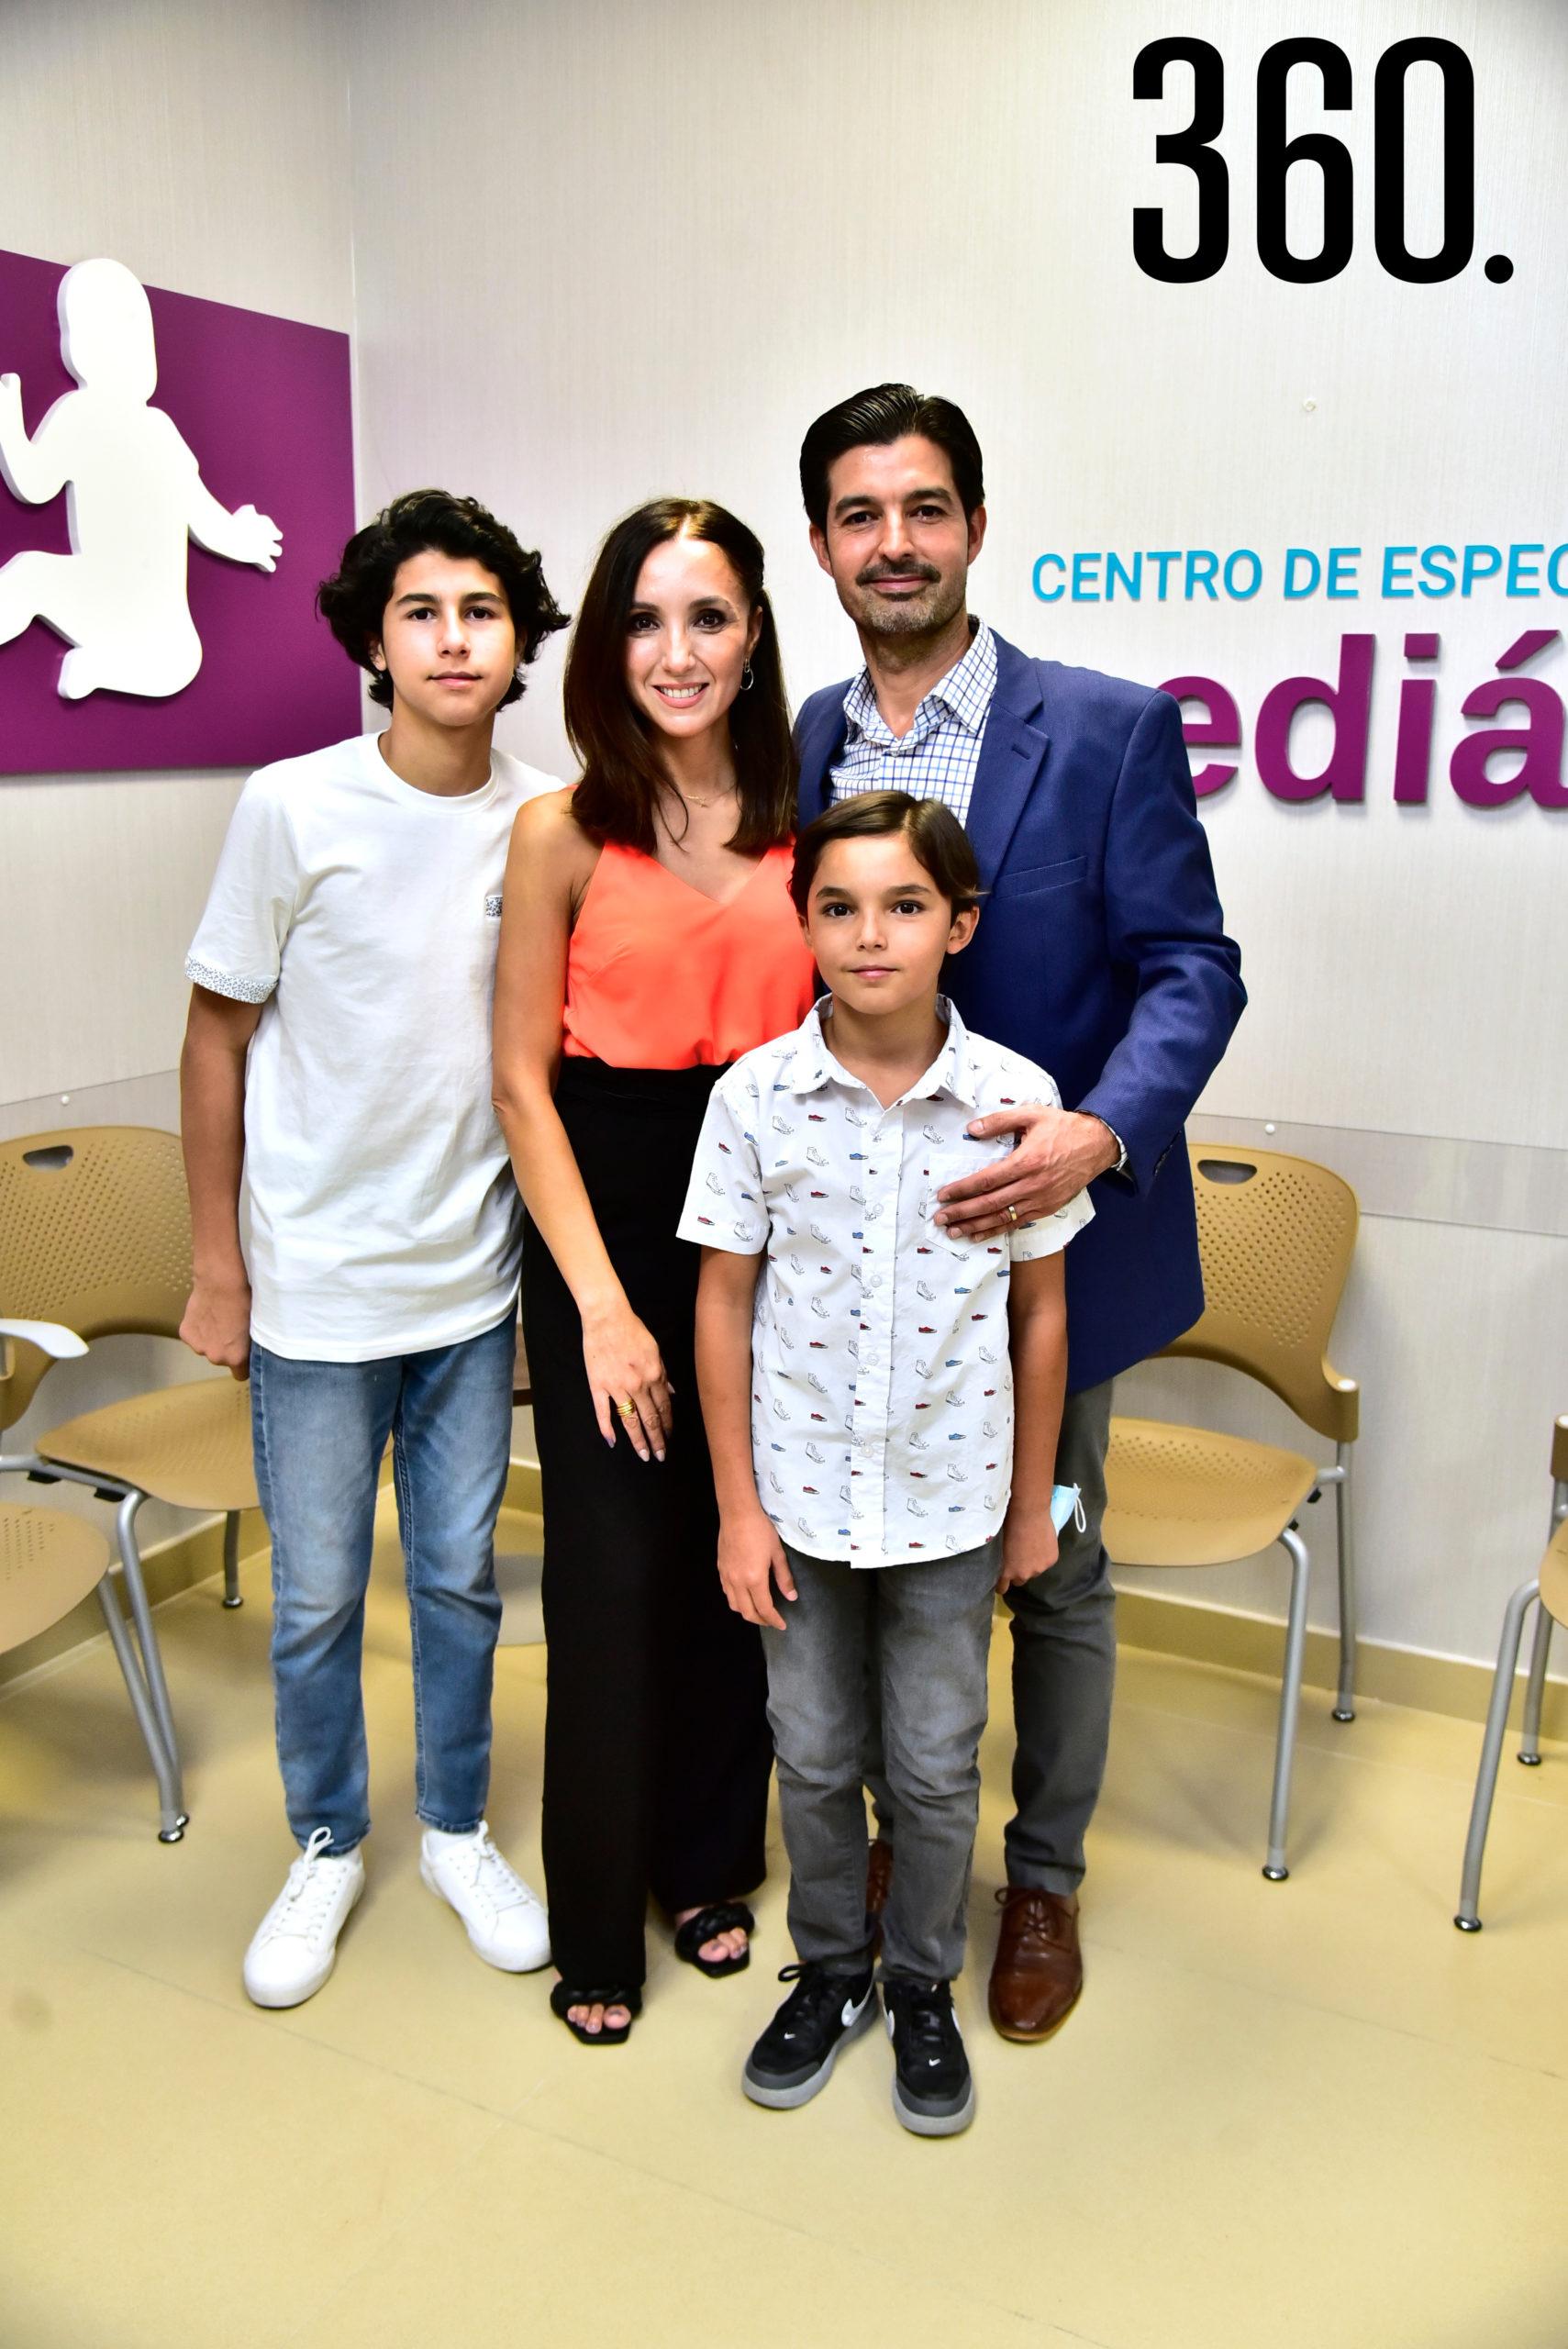 Jorge Pablo Valdez, Paola Álvarez de Valdez, Dr. Jorge Valdez Ceballos y Patricio Valdez.